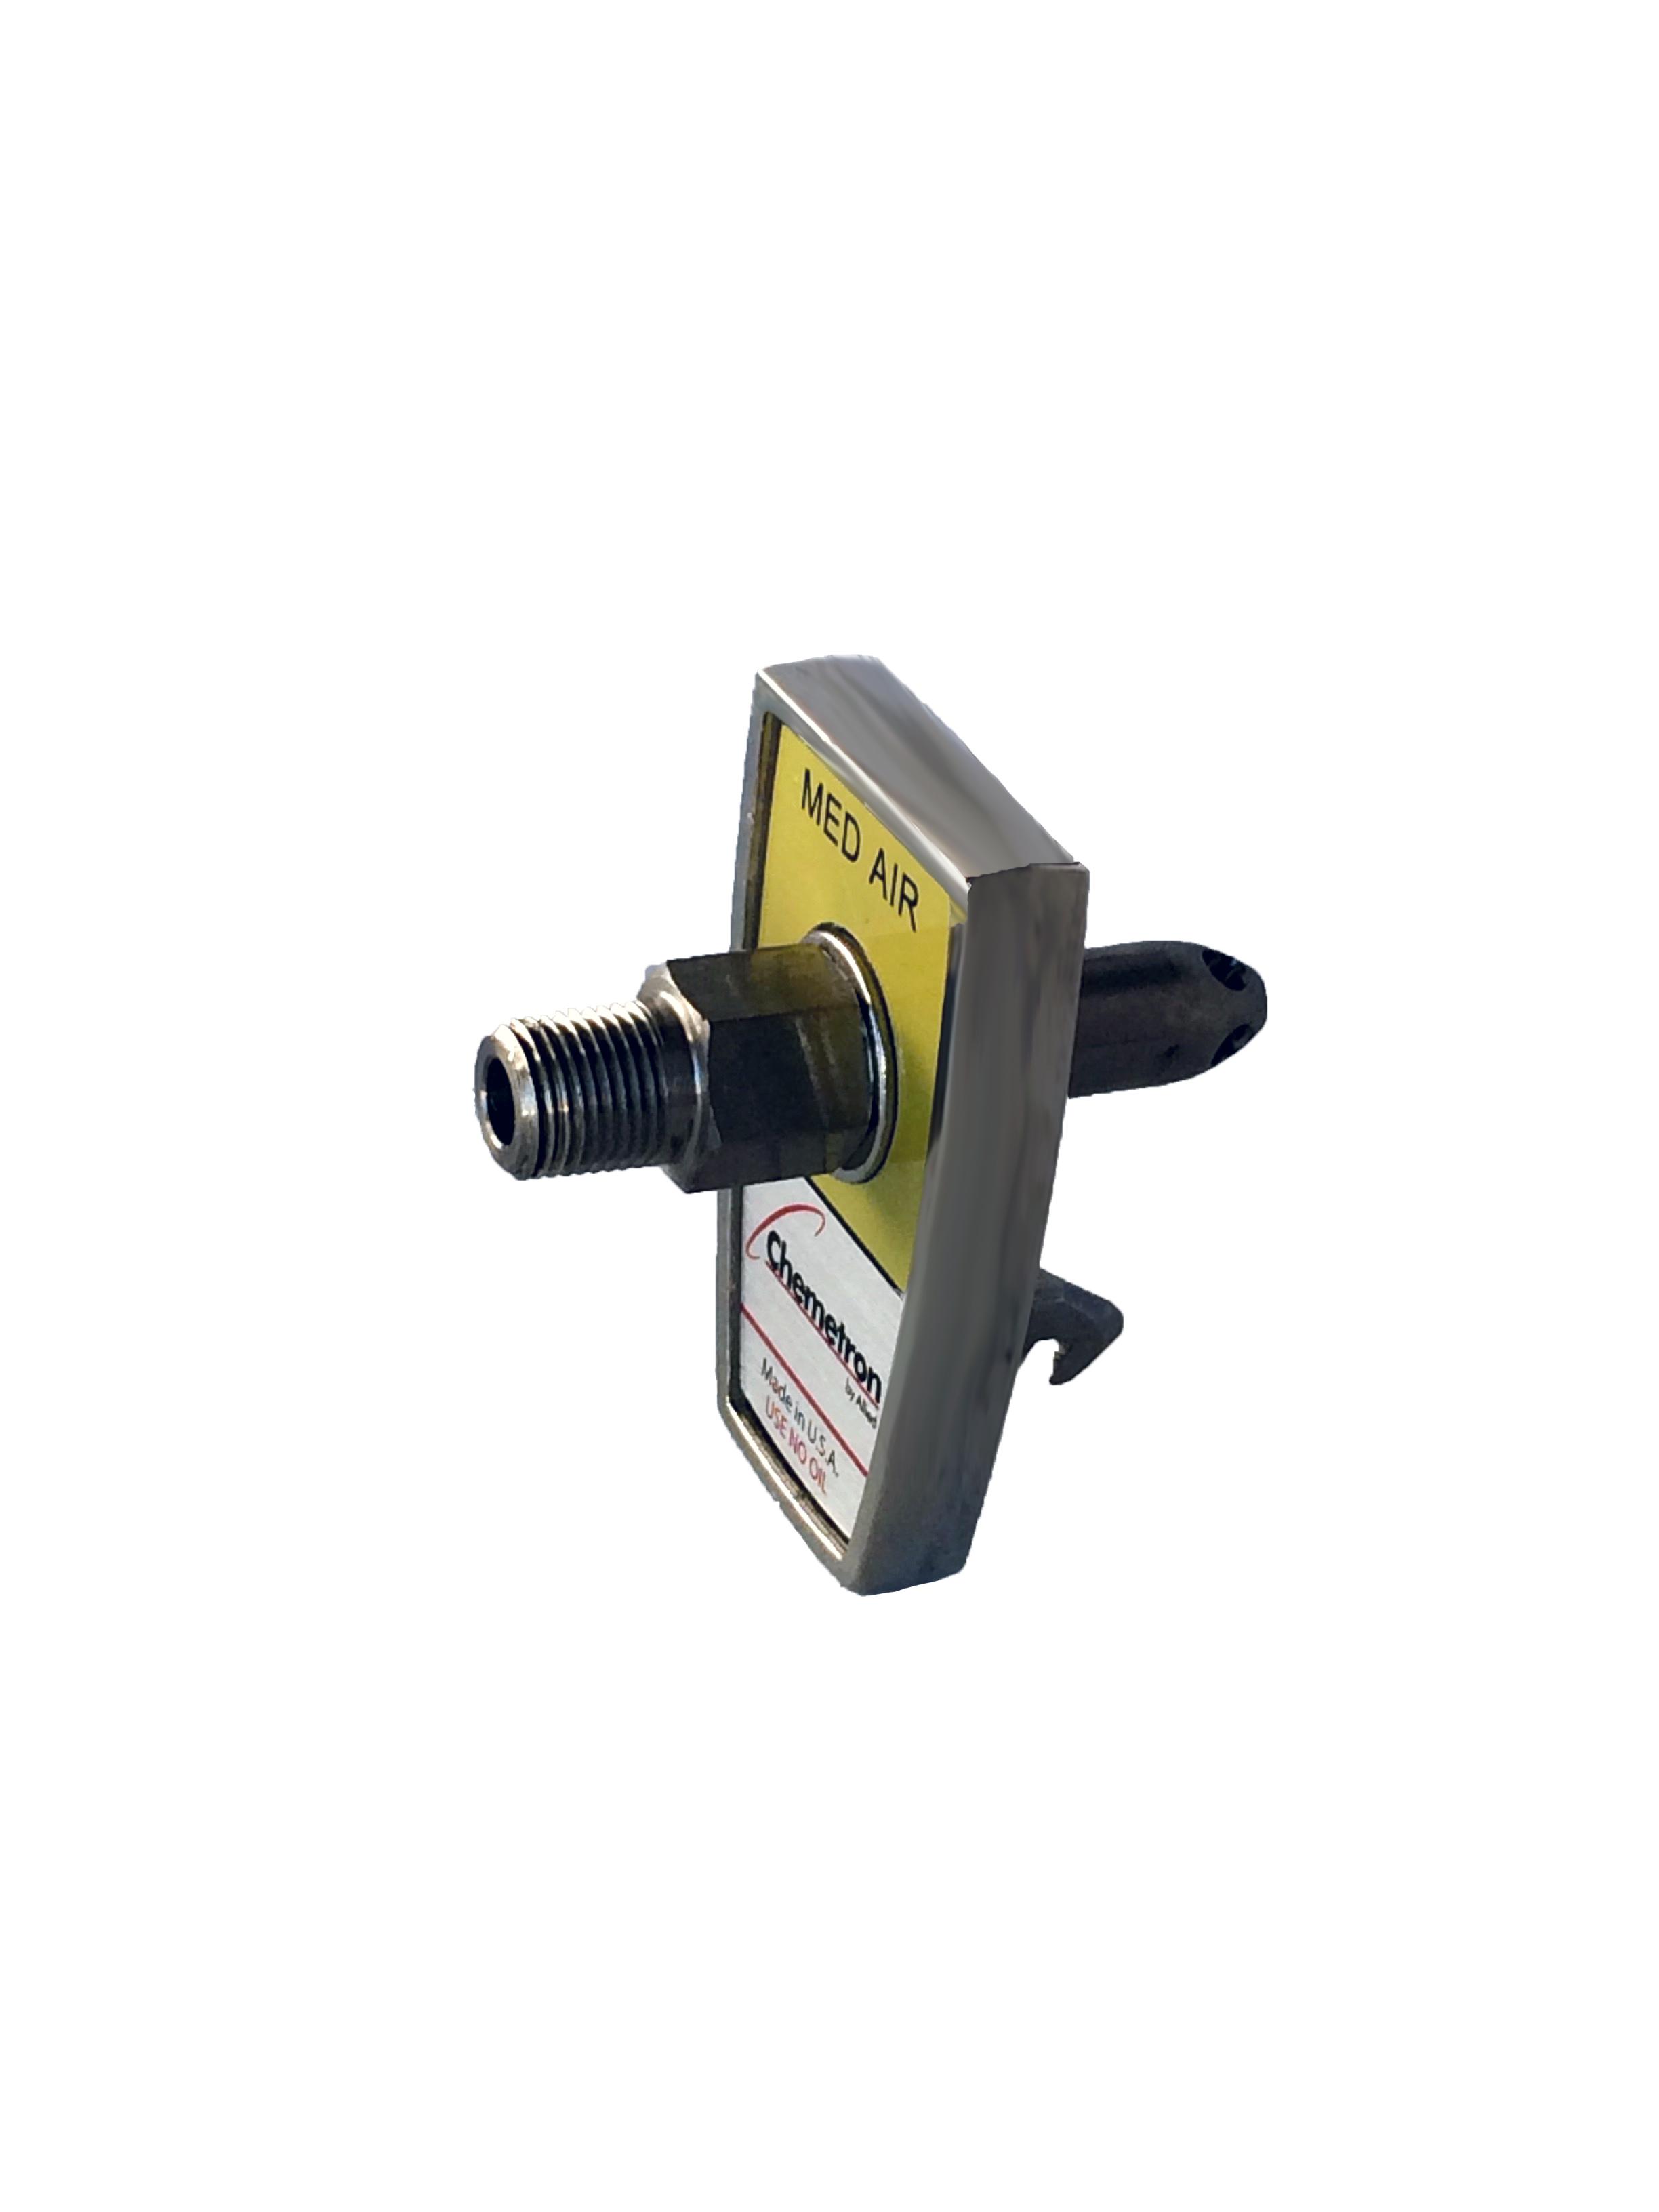 Chemetron (Adapters)